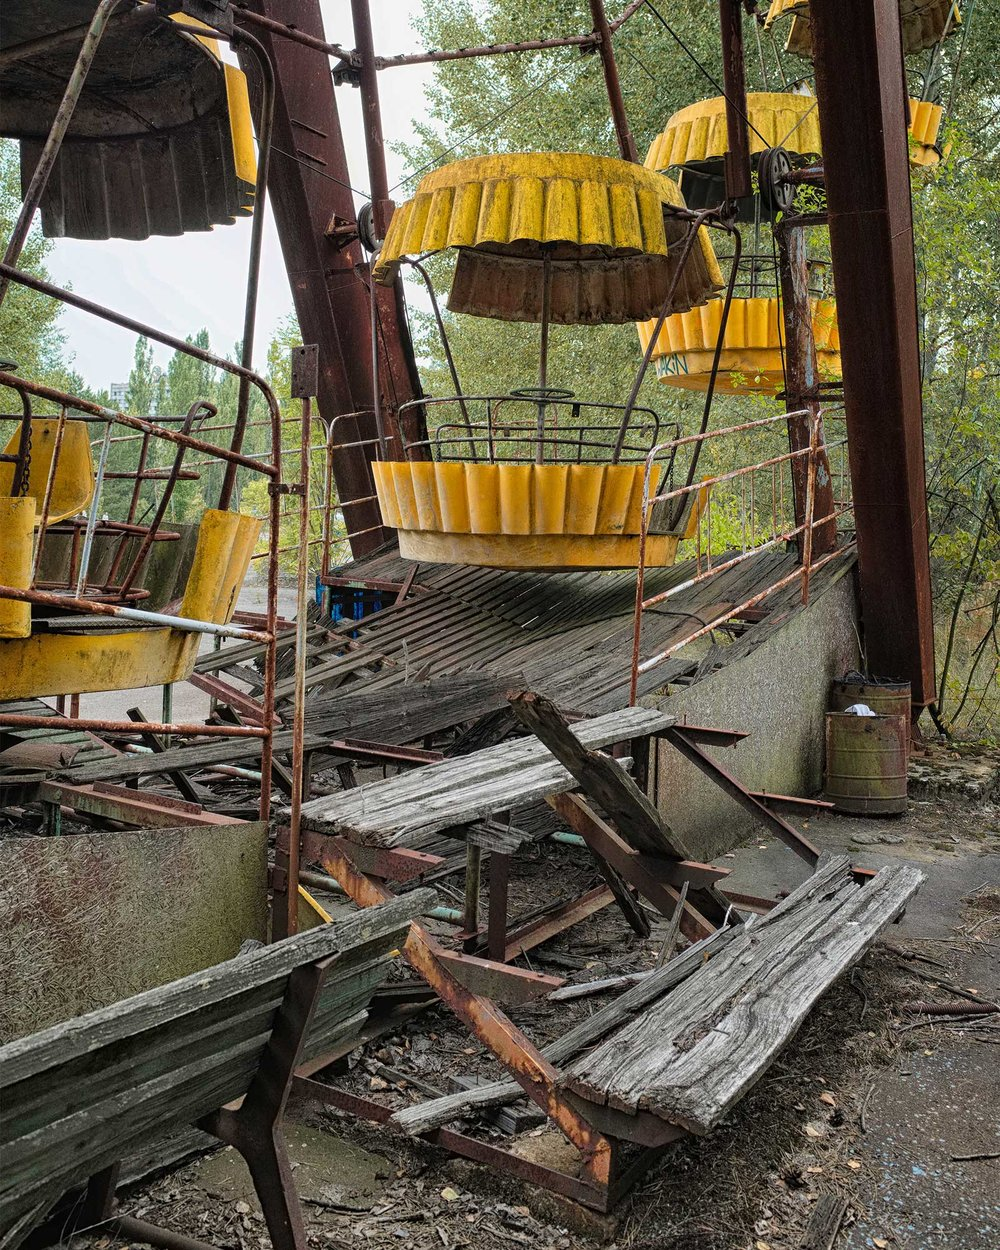 068_chernobyl_AmusementPark_w.jpg